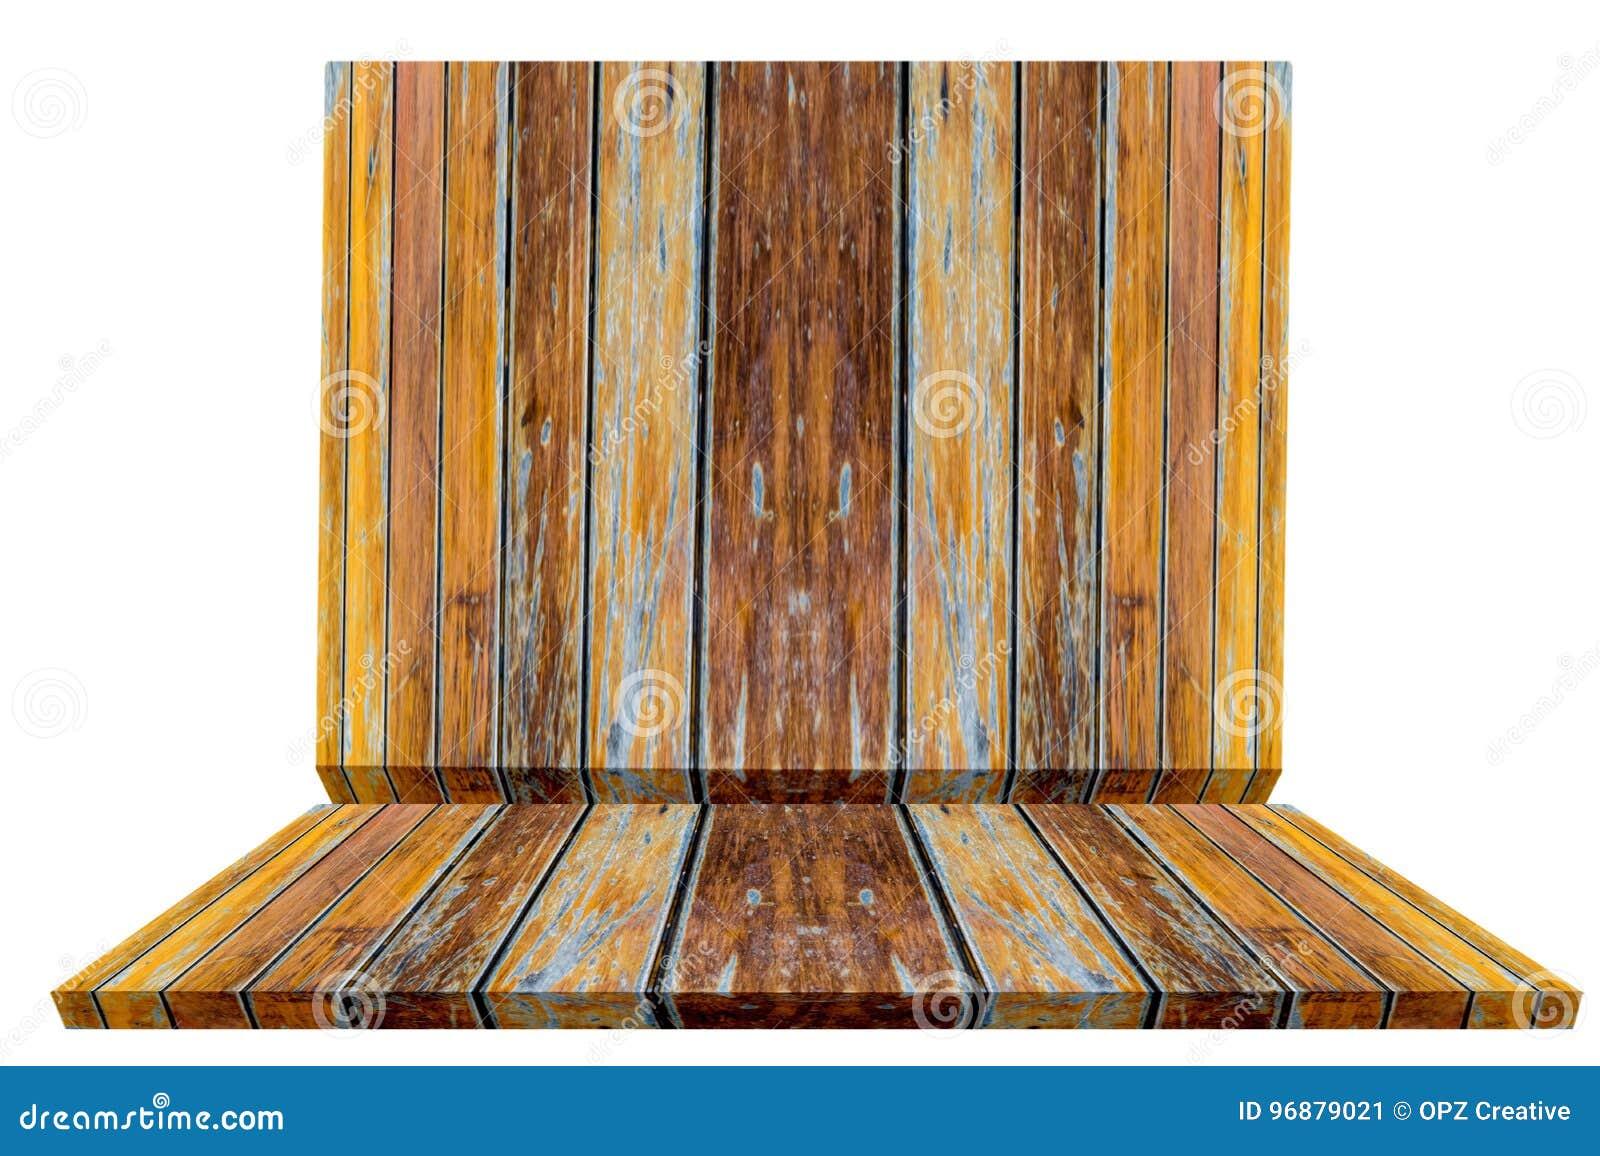 Wood Shelf On White Background Using Wallpaper Or Background